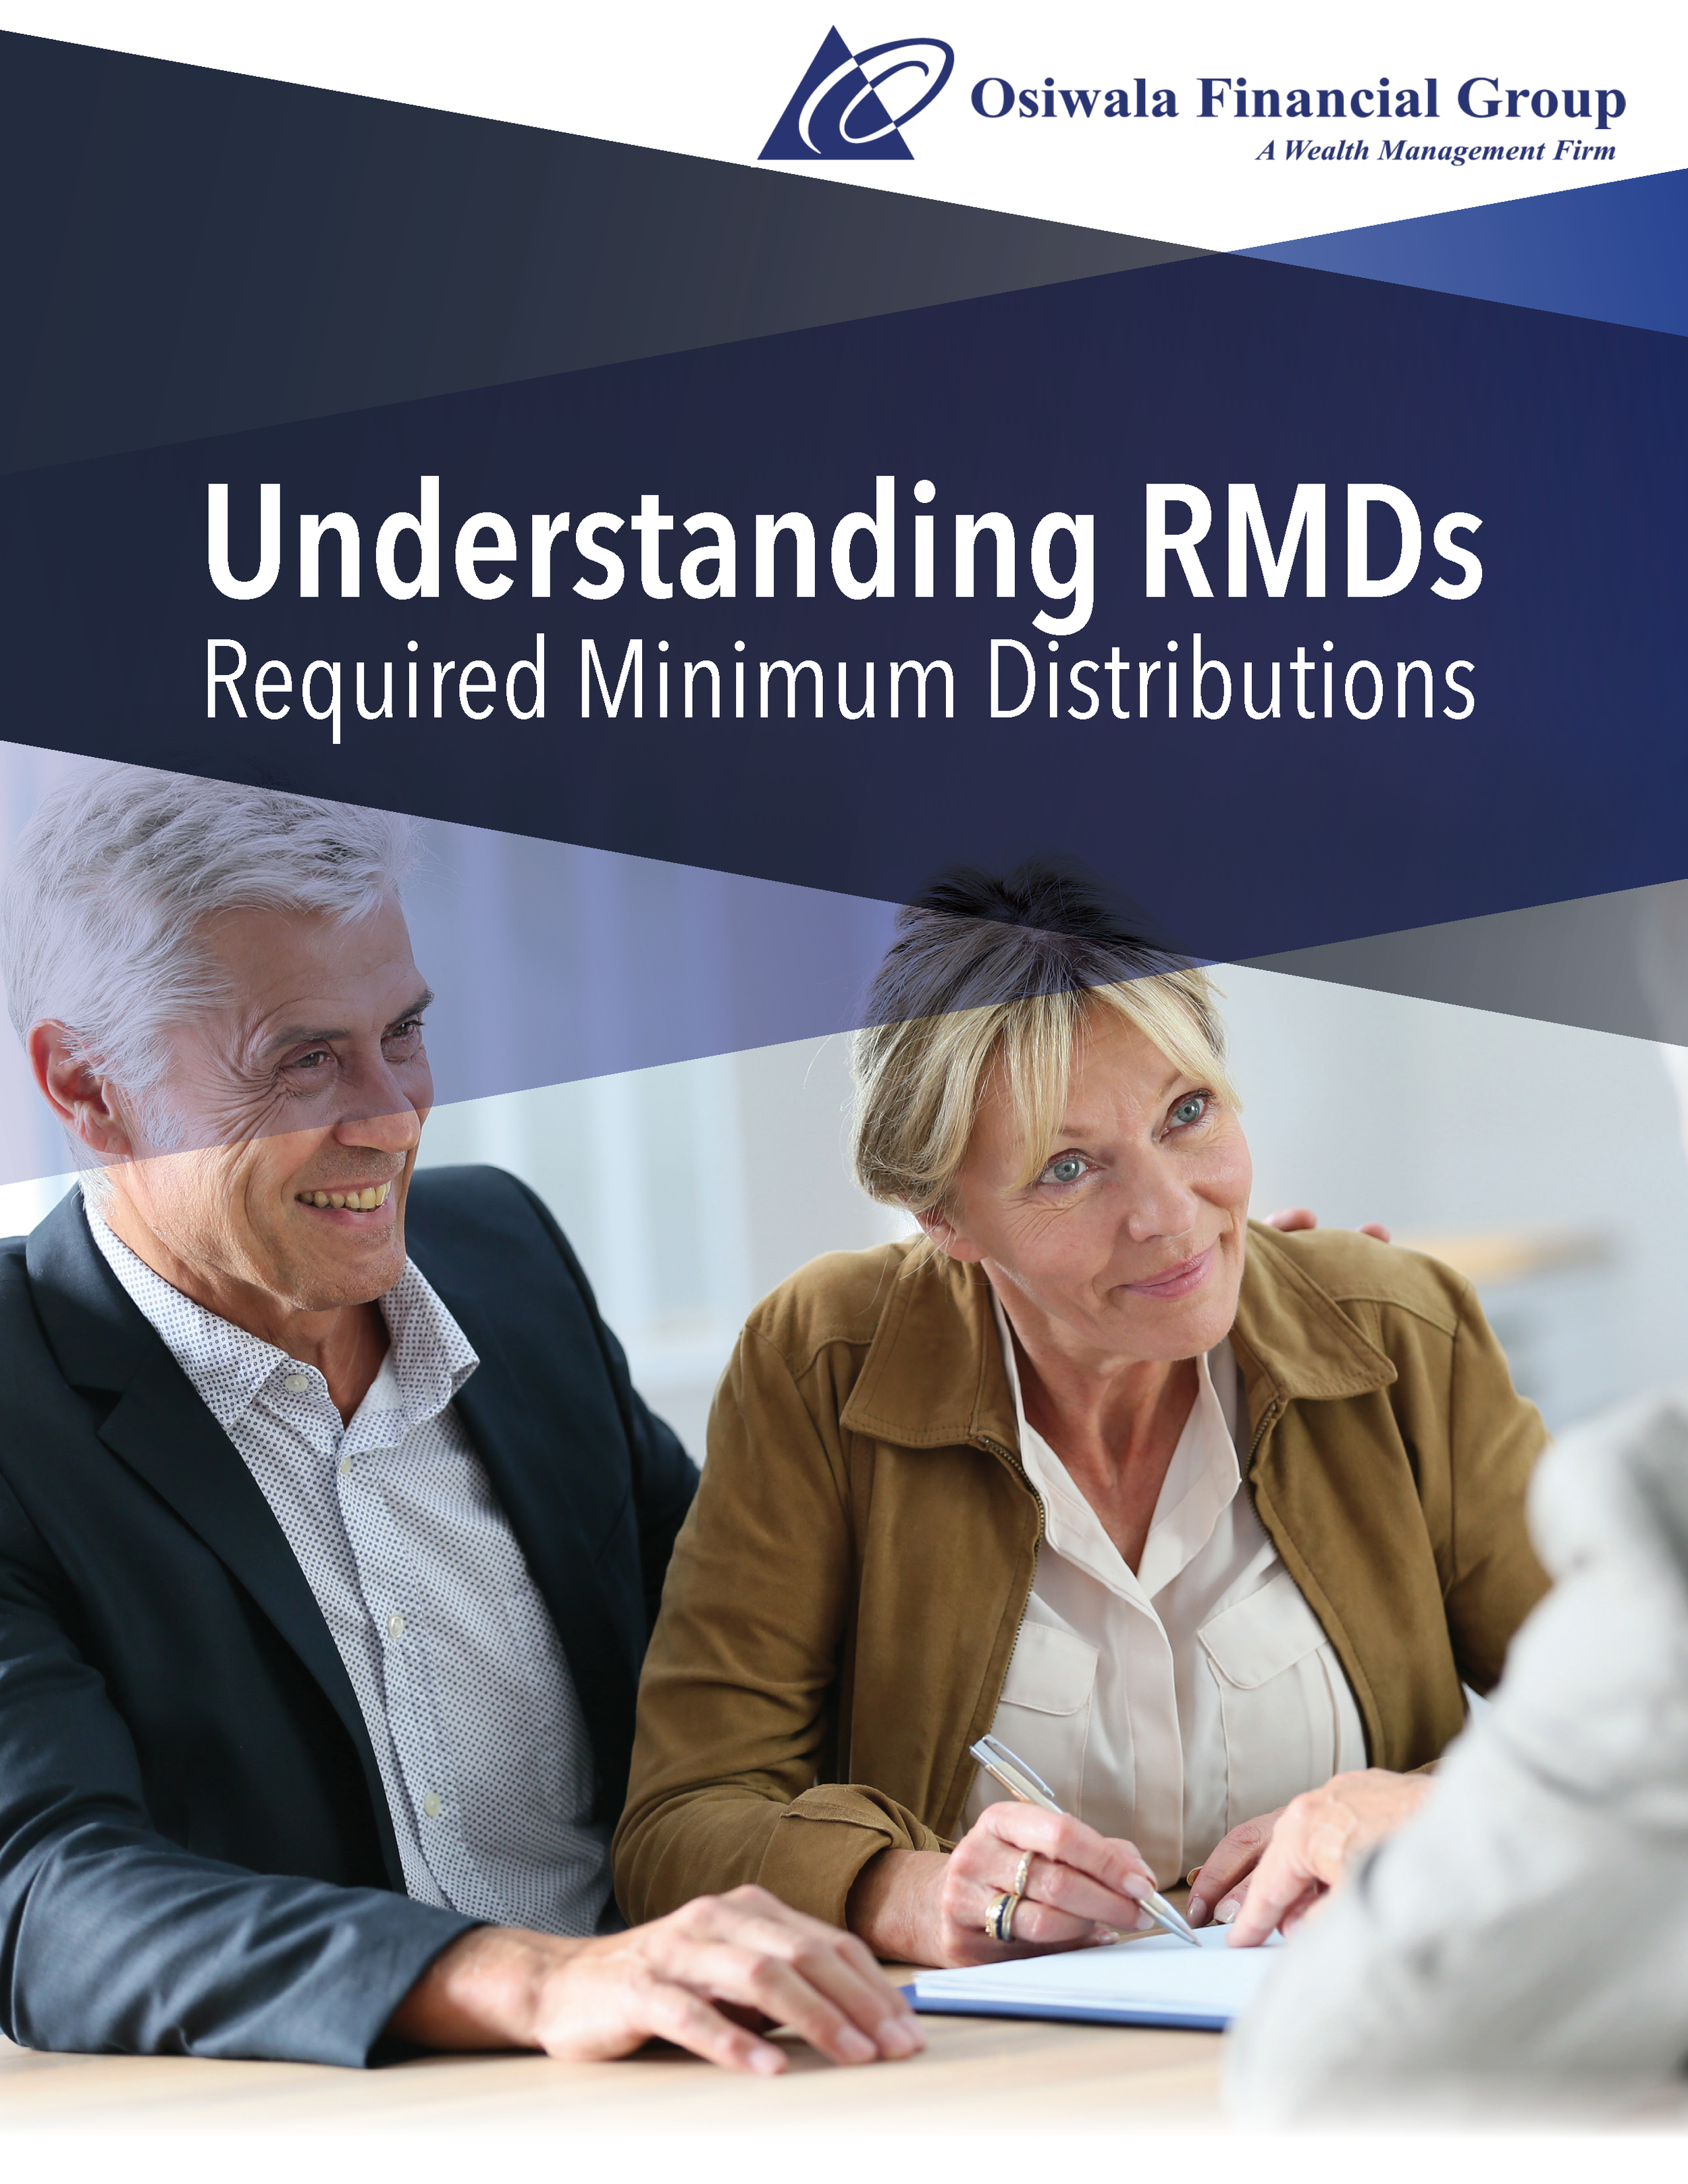 Understanding Required Minimum Distributions (RMDs)